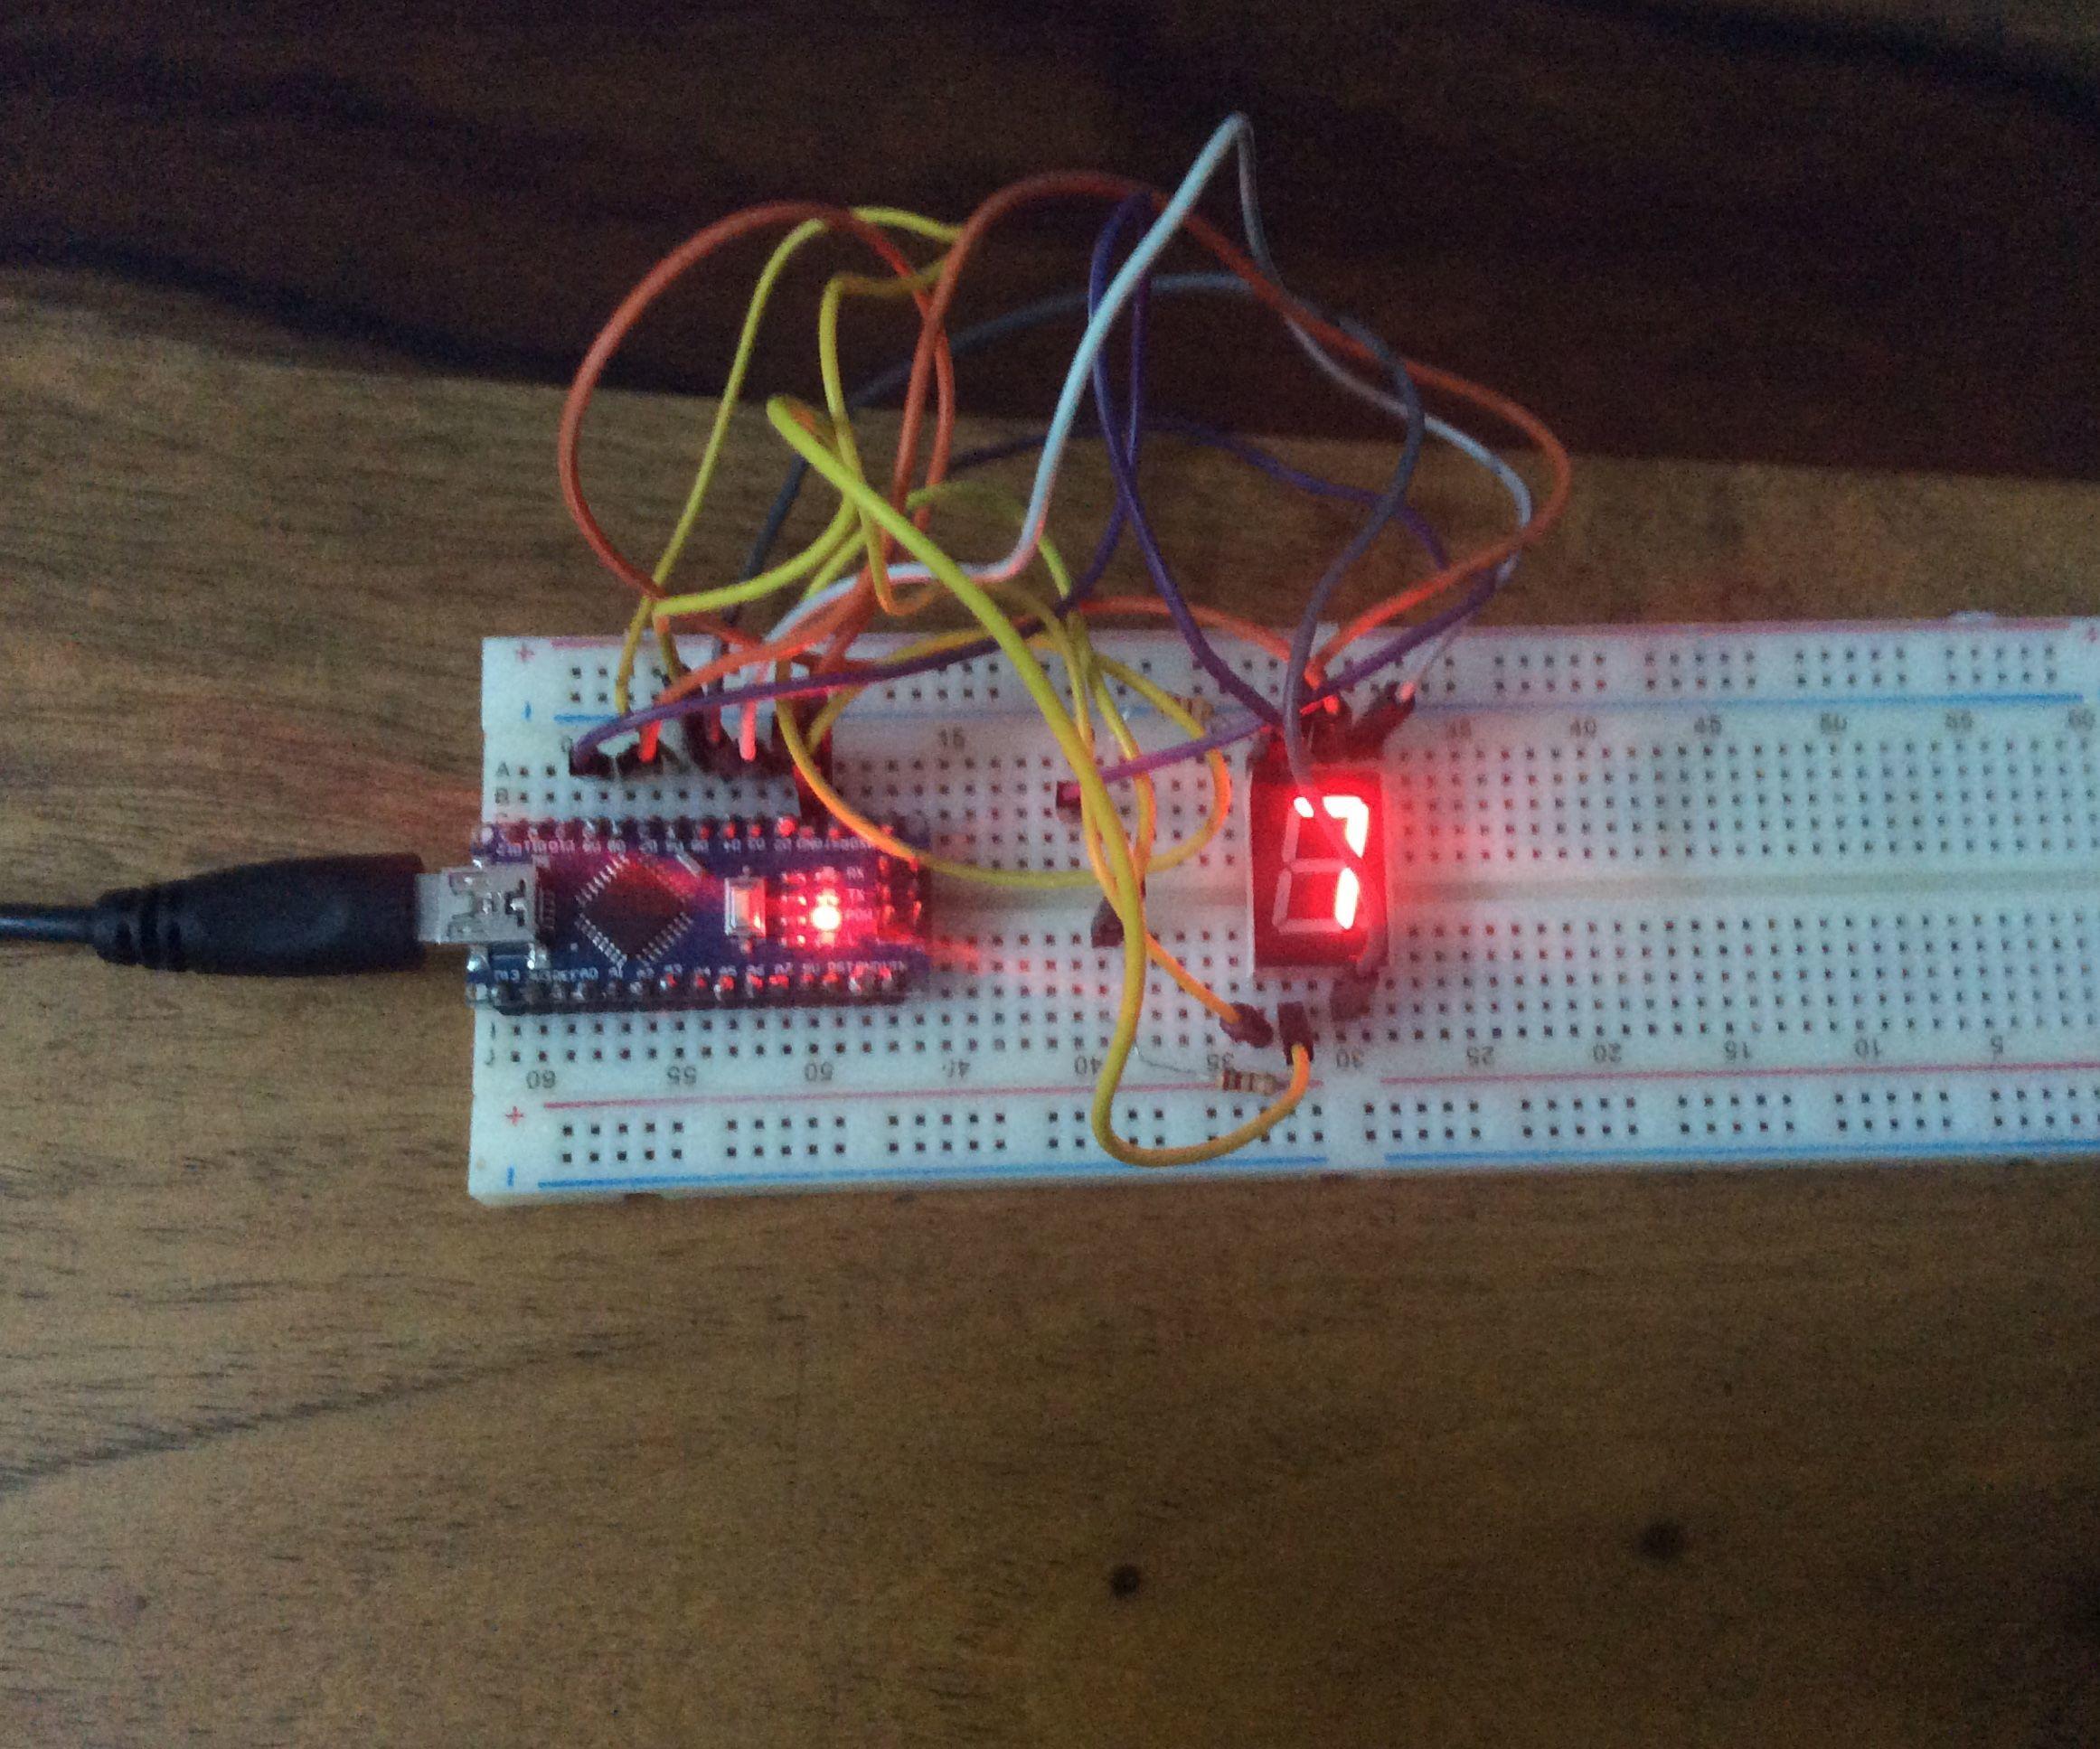 How to make a 0-9 counter using an Arduino Nano